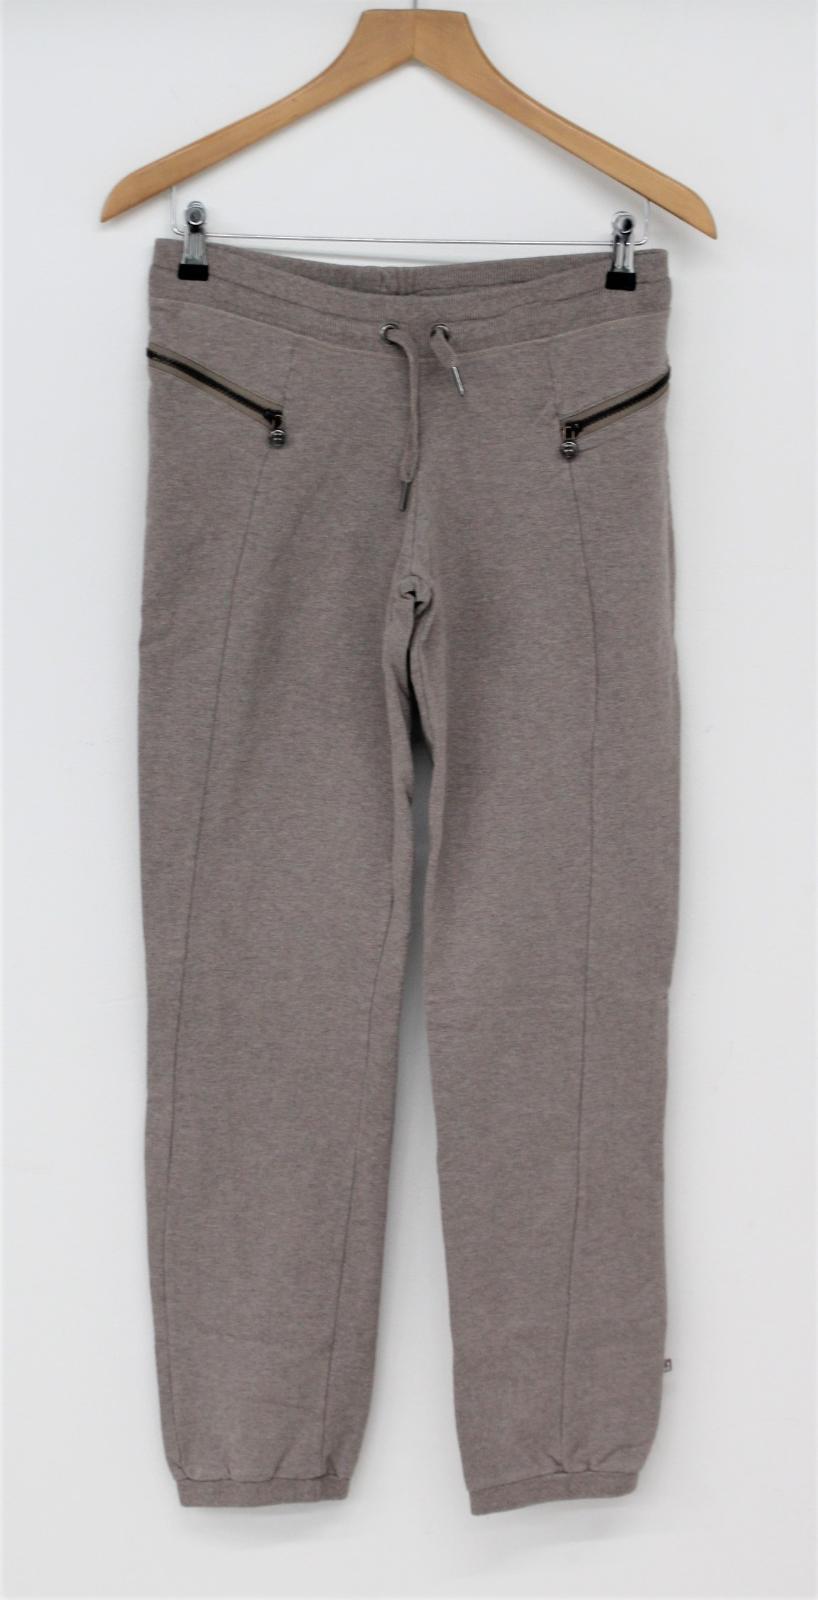 Sweaty-Betty-Damas-Malva-Mezcla-de-Algodon-Cintura-Elastica-Correr-Pantalones-S-W30 miniatura 11